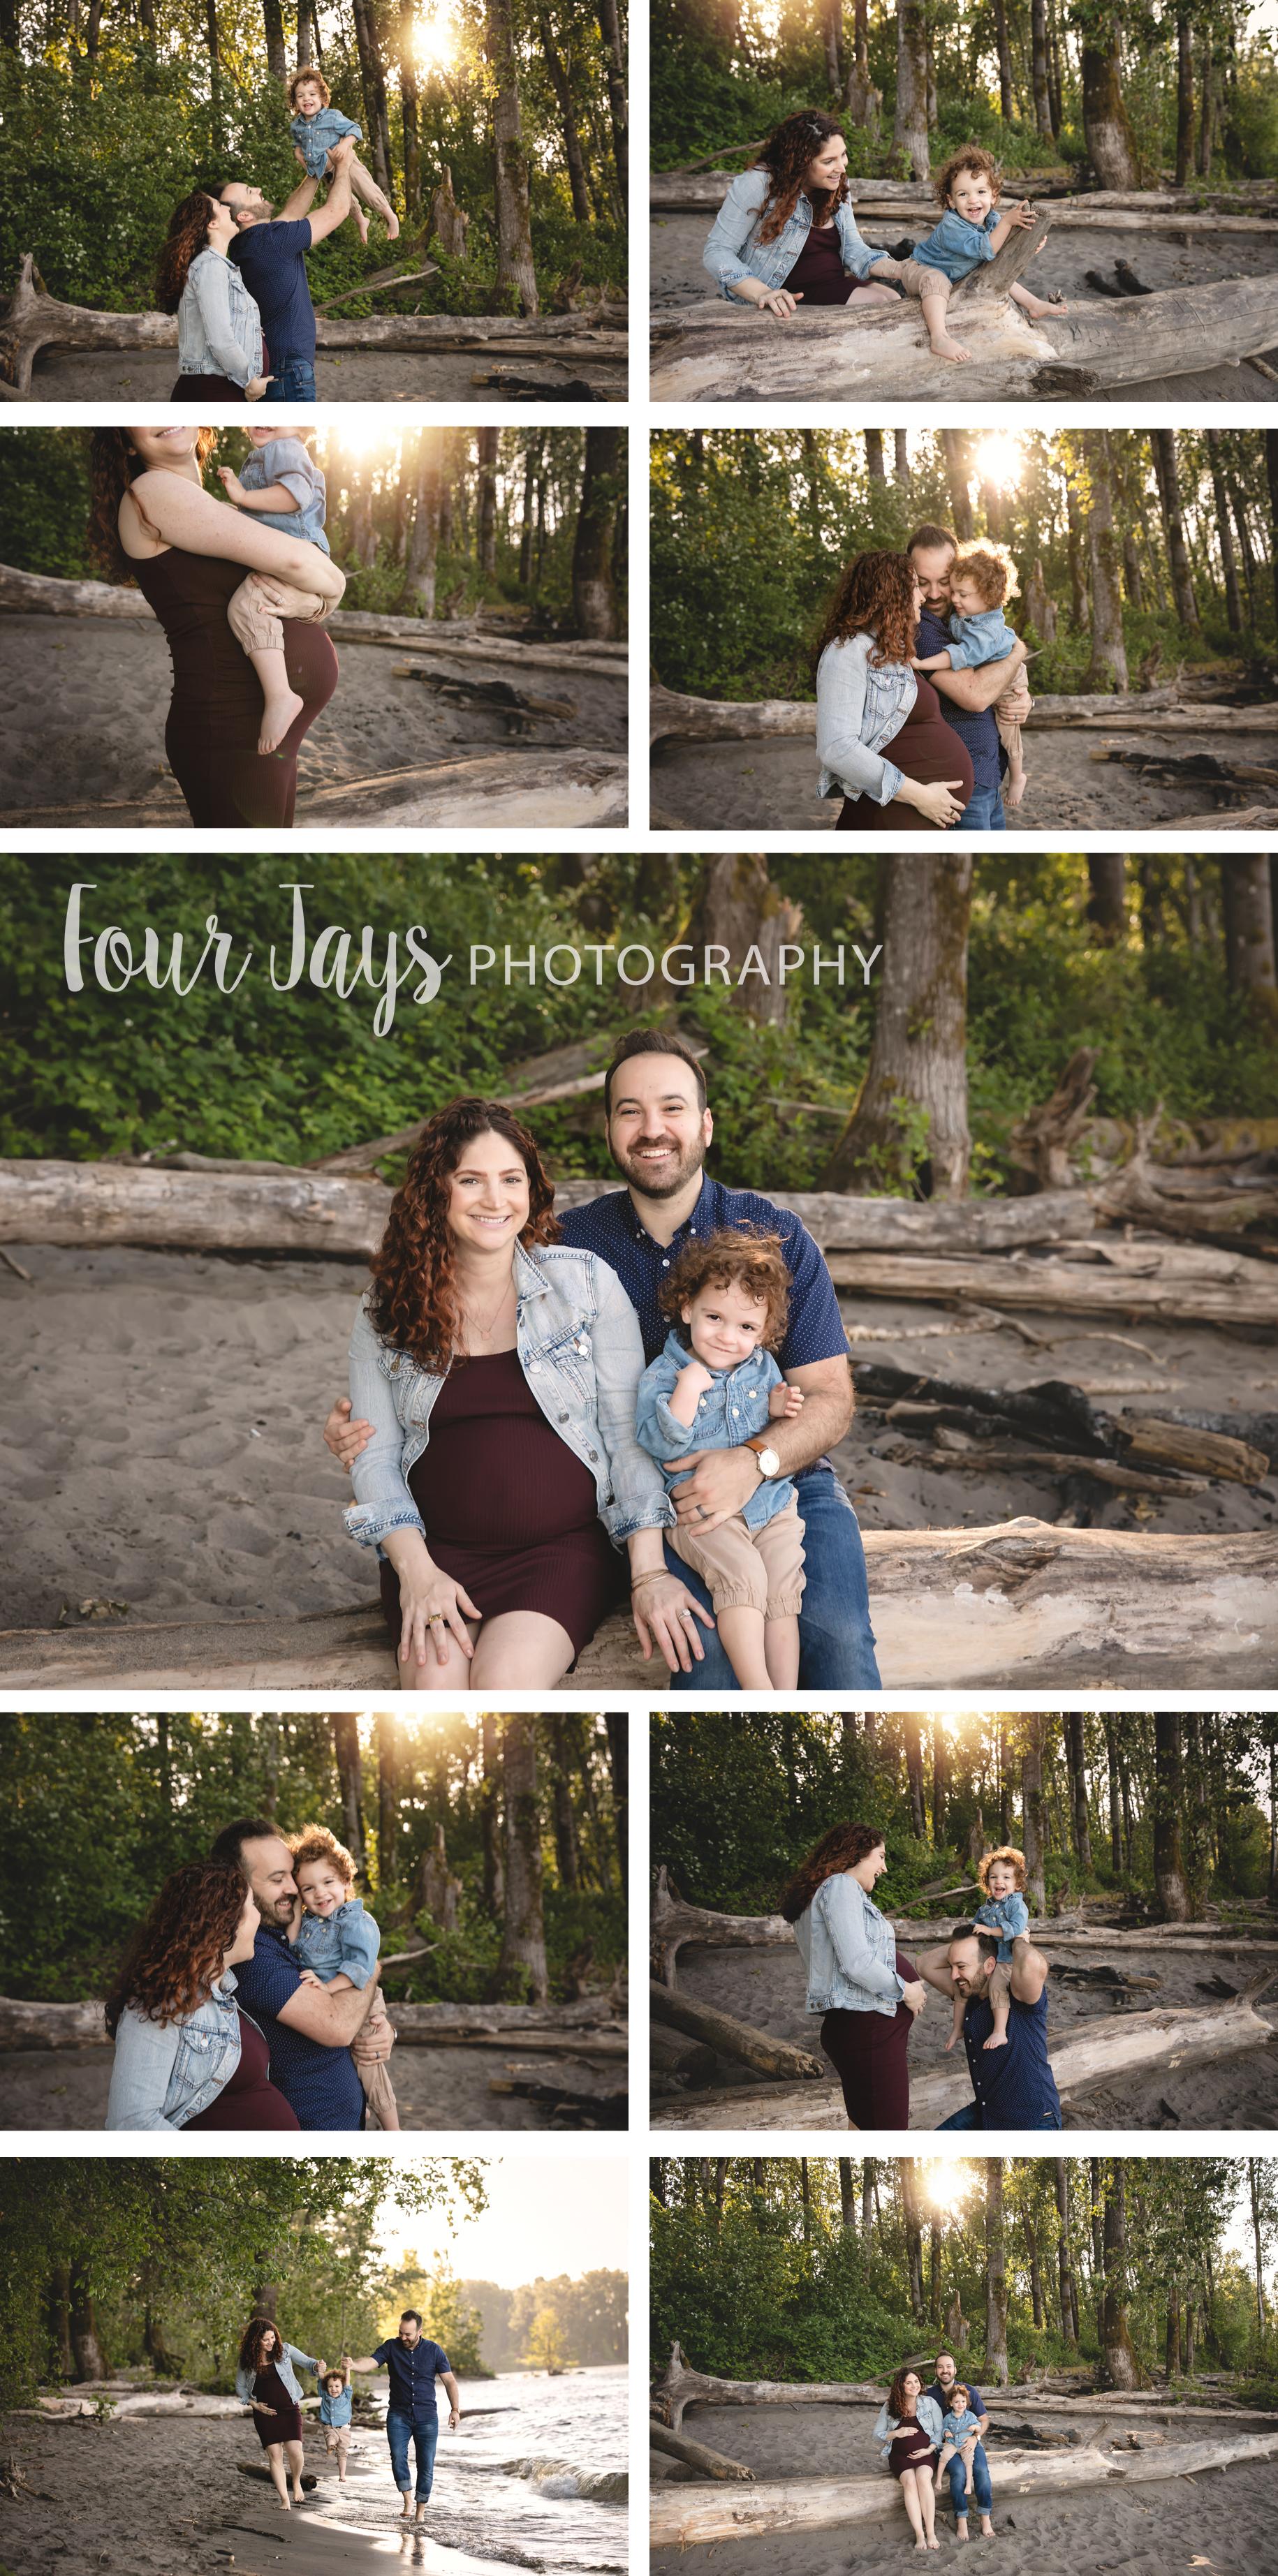 Blog — Four Jays Photography